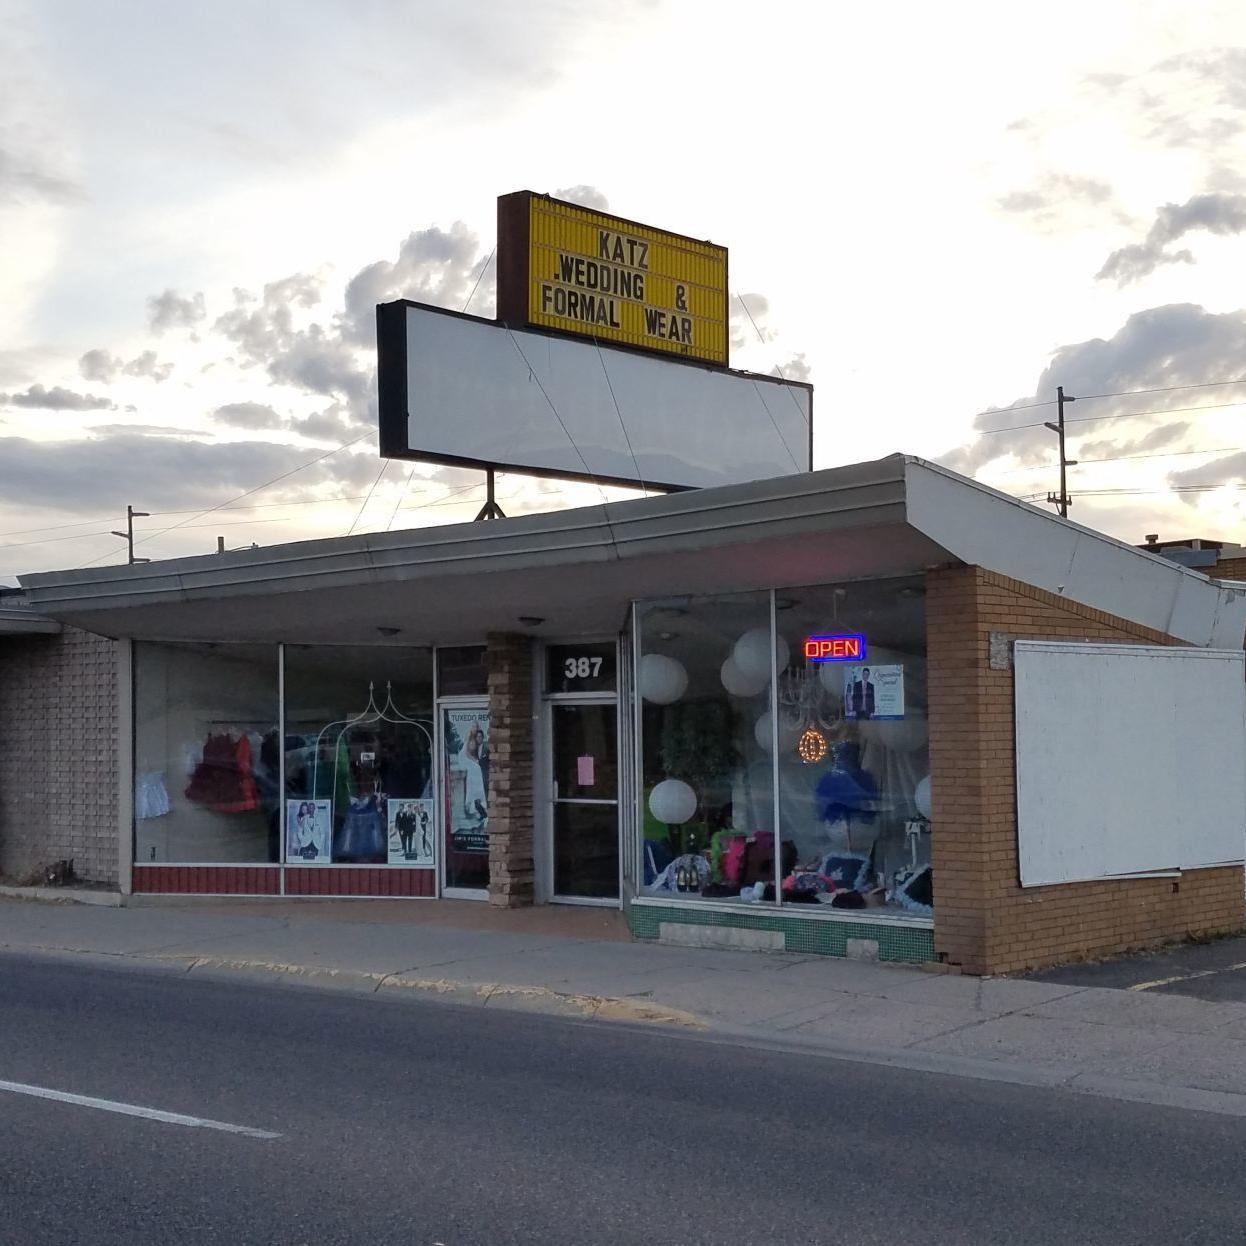 Pocatello business owner under investigation after selling CBD oil